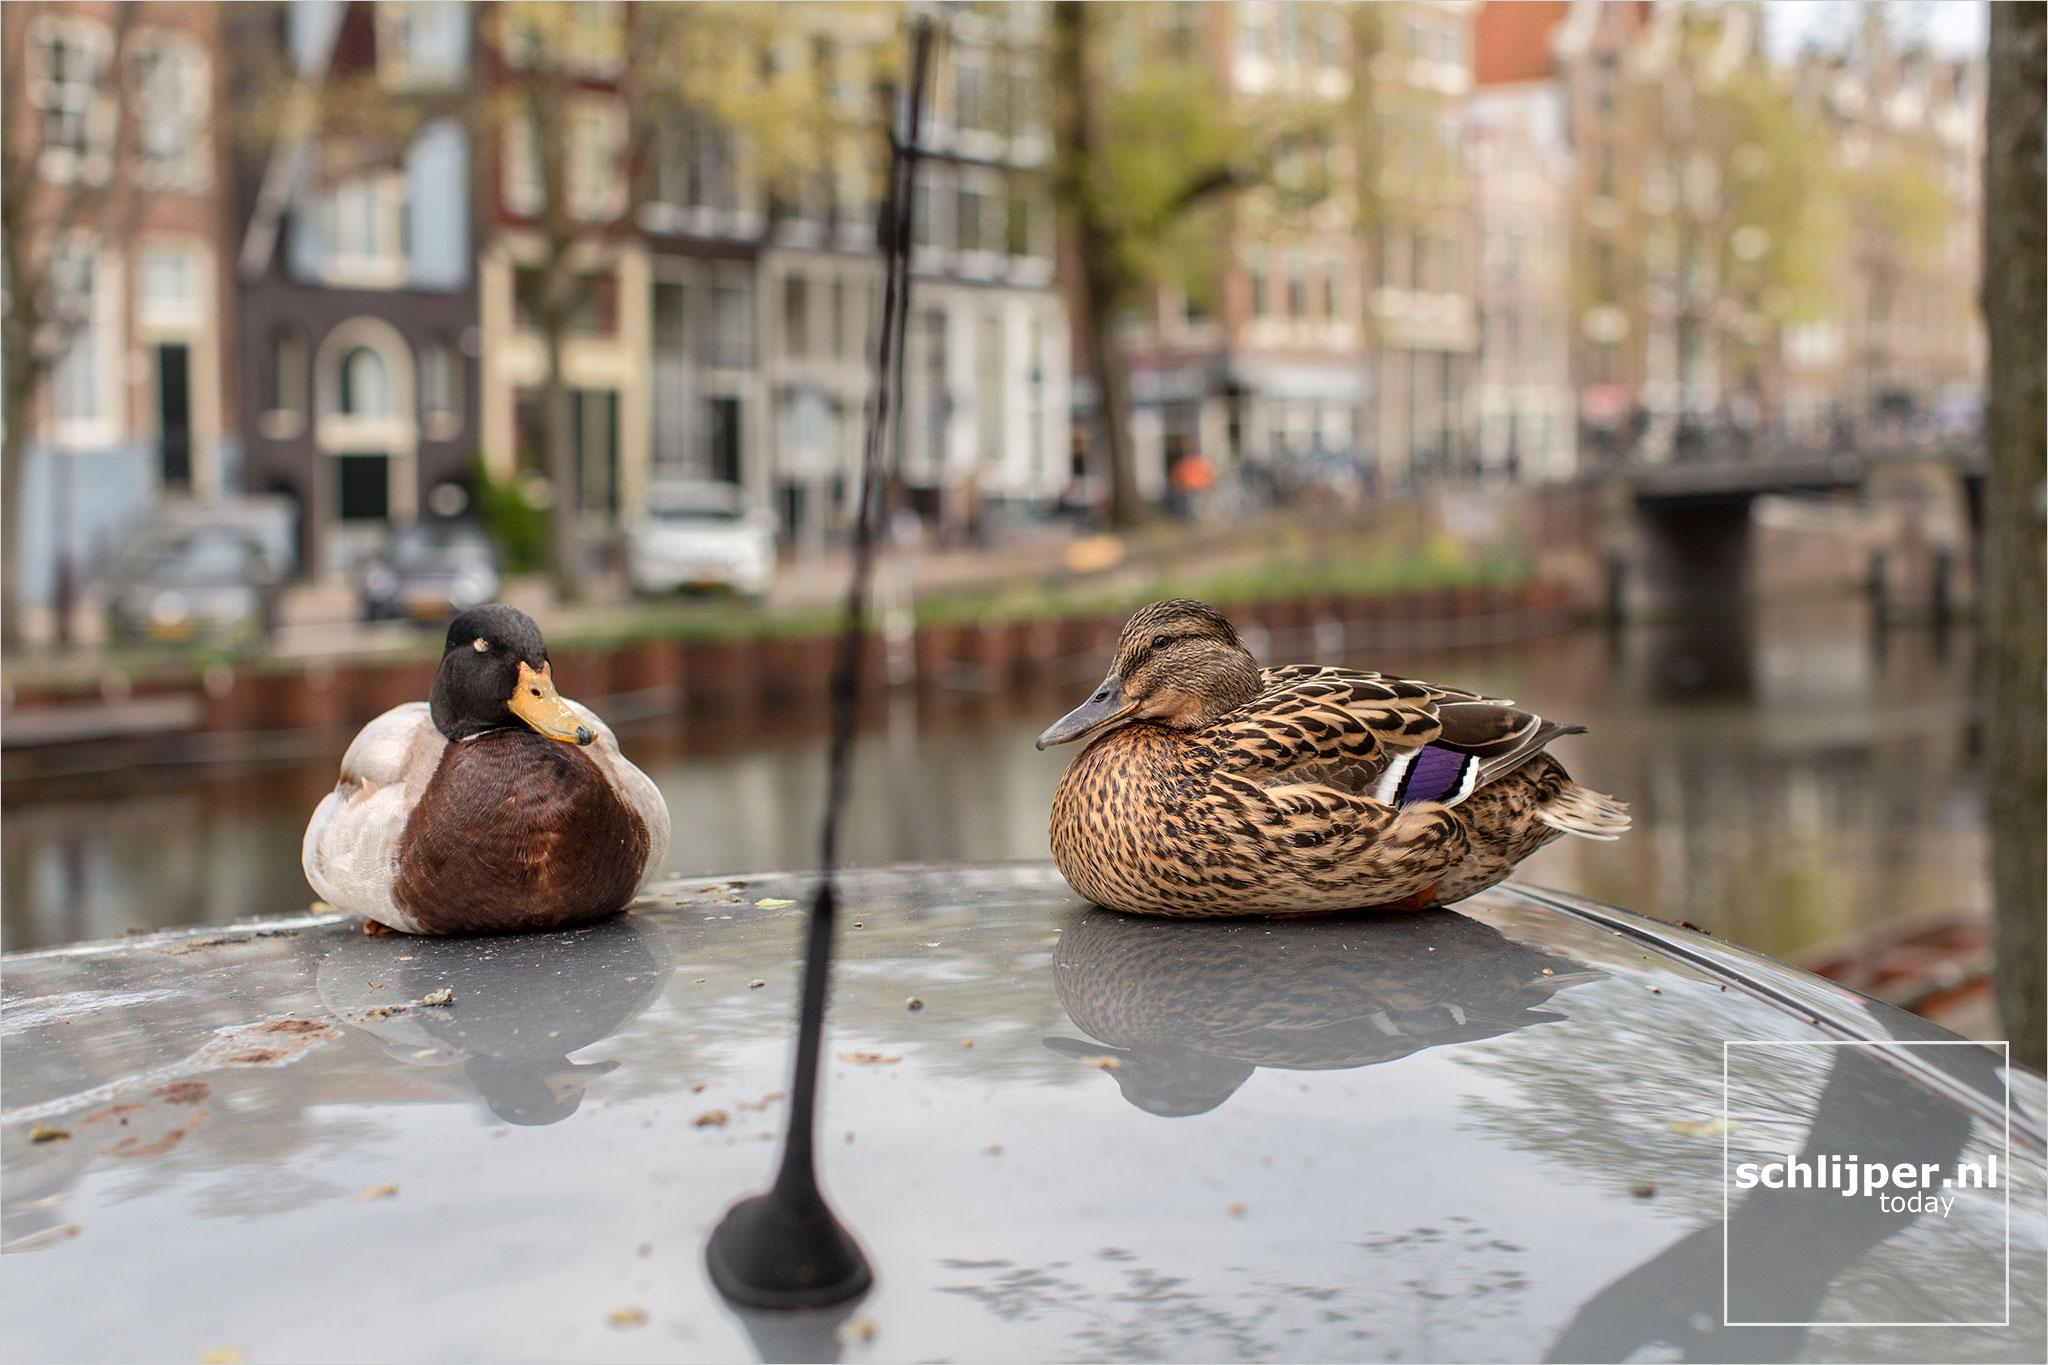 The Netherlands, Amsterdam, 6 mei 2021